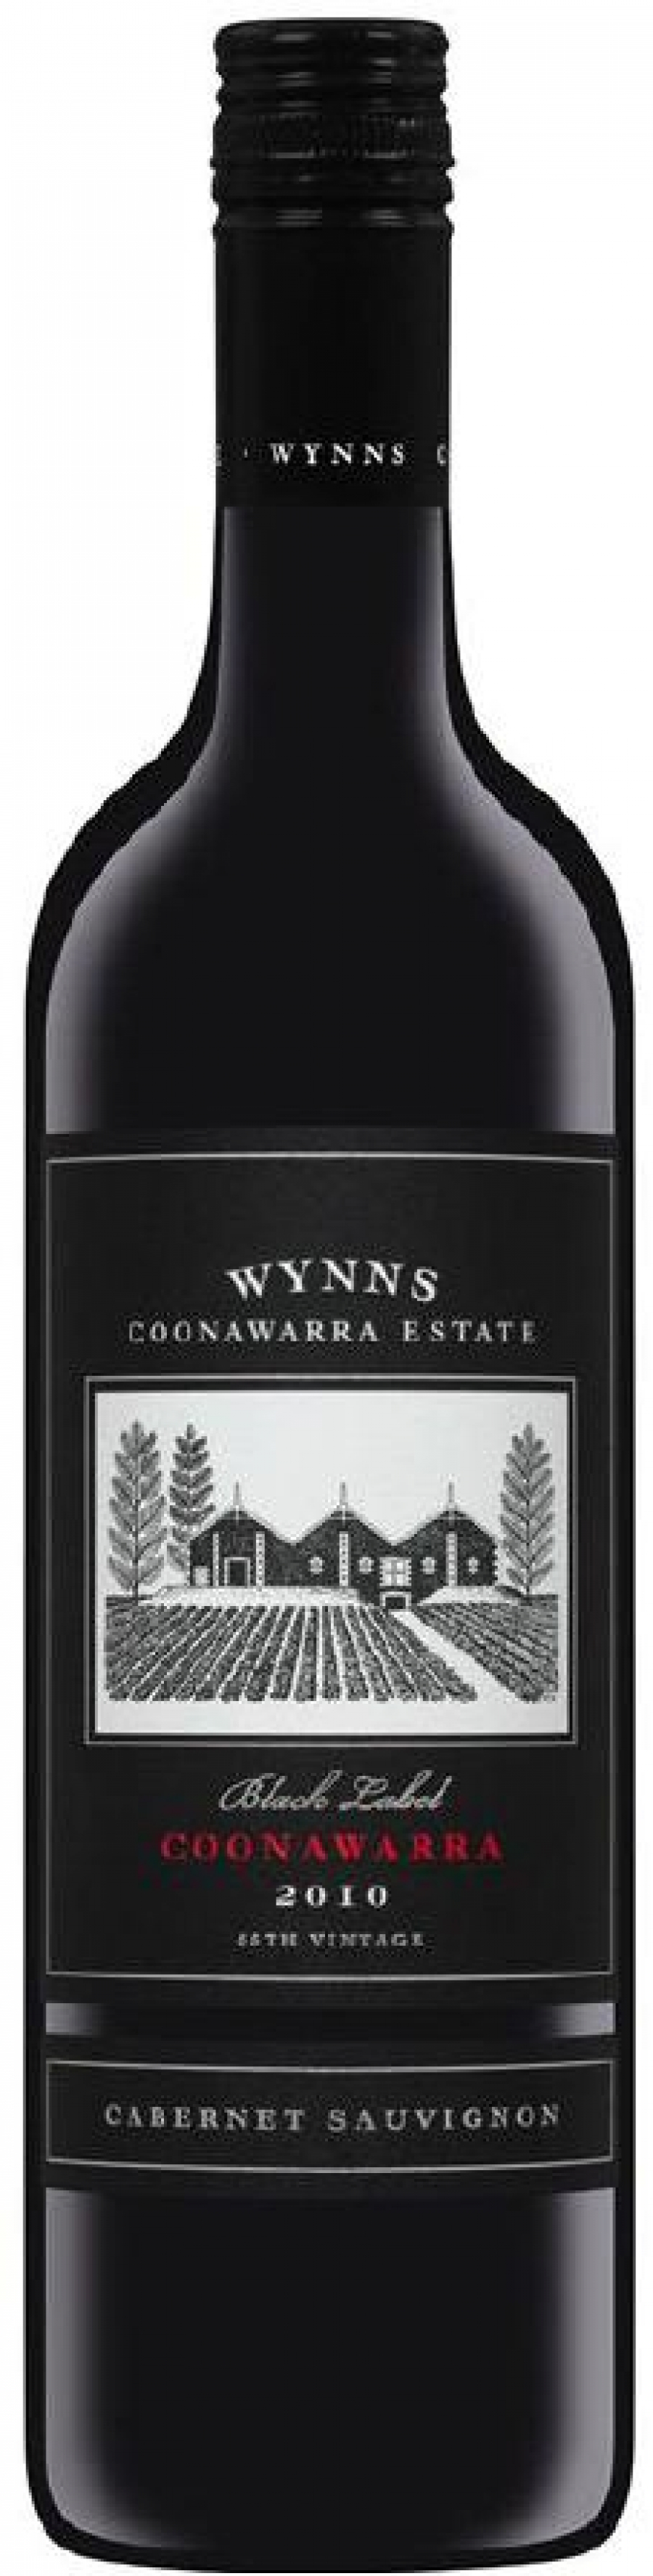 This is a graphic of Declarative Wynns Coonawarra Estate Black Label Cabernet Sauvignon